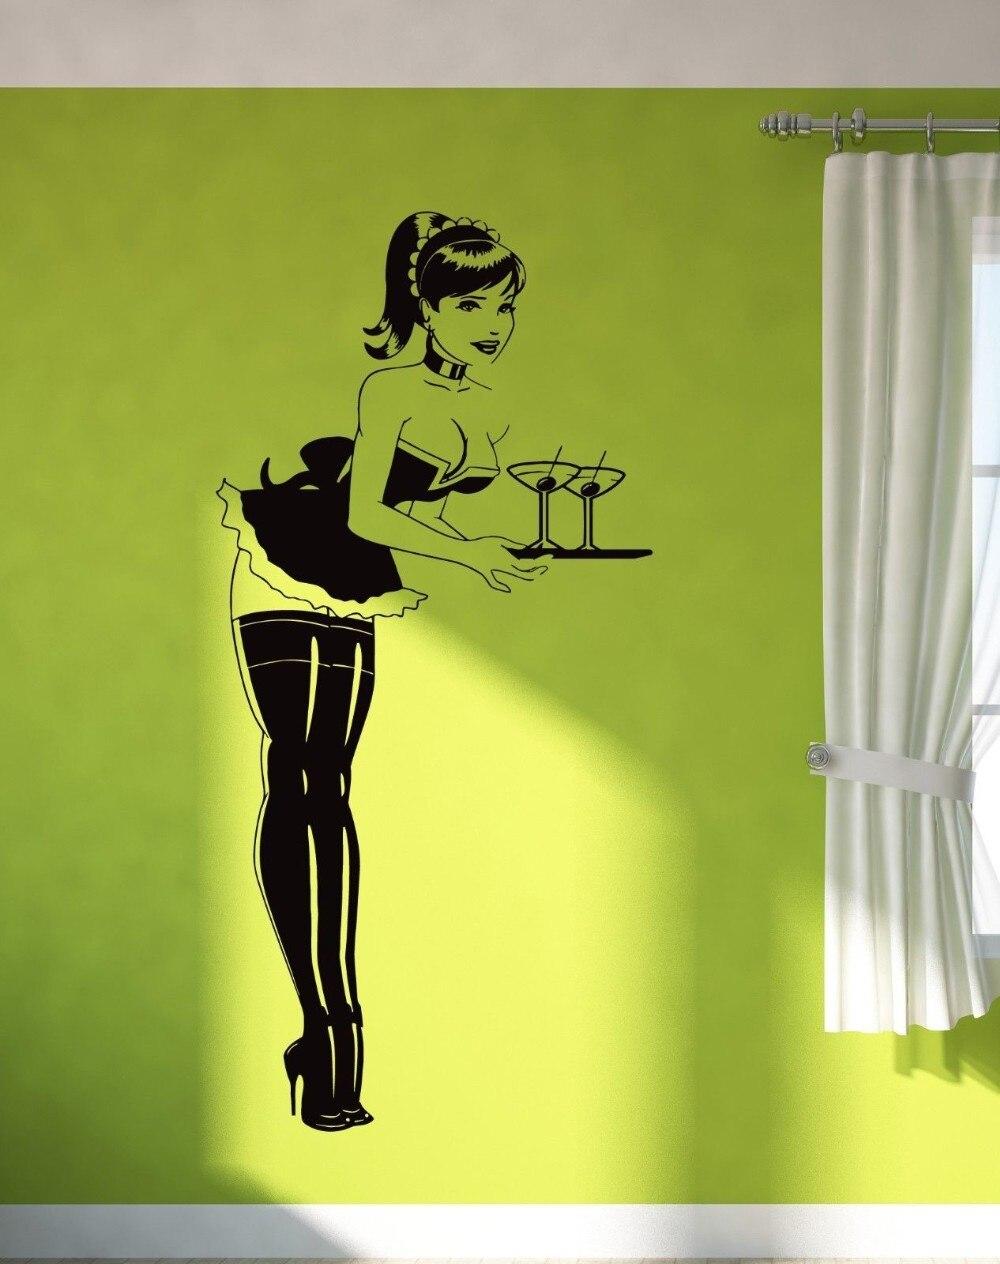 Hot Sexy Girl Teen Woman Vinyl Wall Decal Short Skirt In Stocking font b Server b